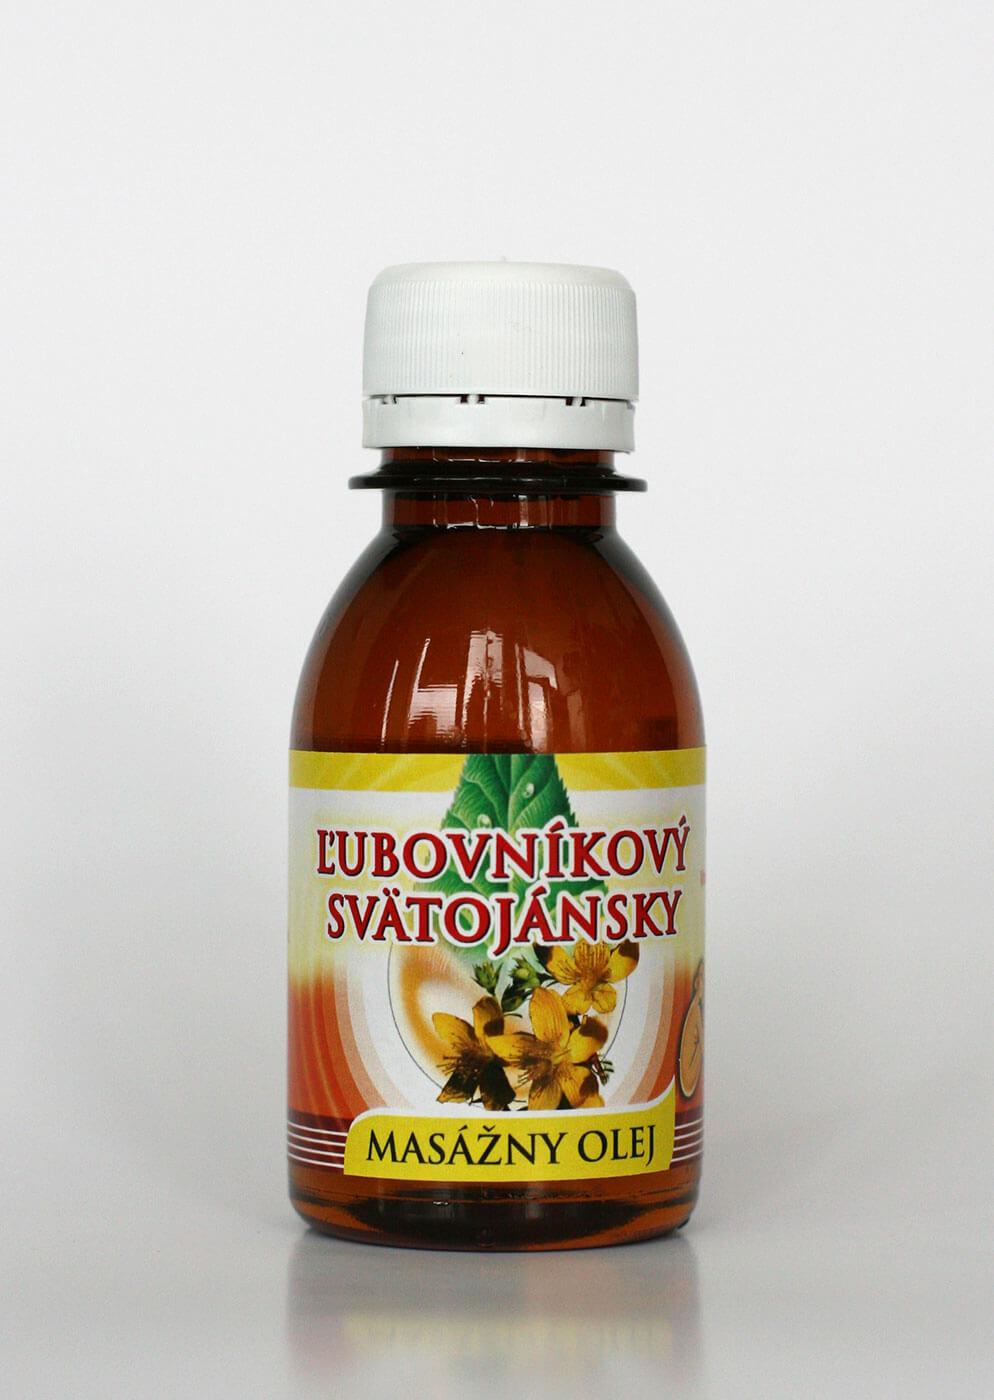 Agrokarpaty Masážny olej ľubovníkový - svätojánsky (0,1l)